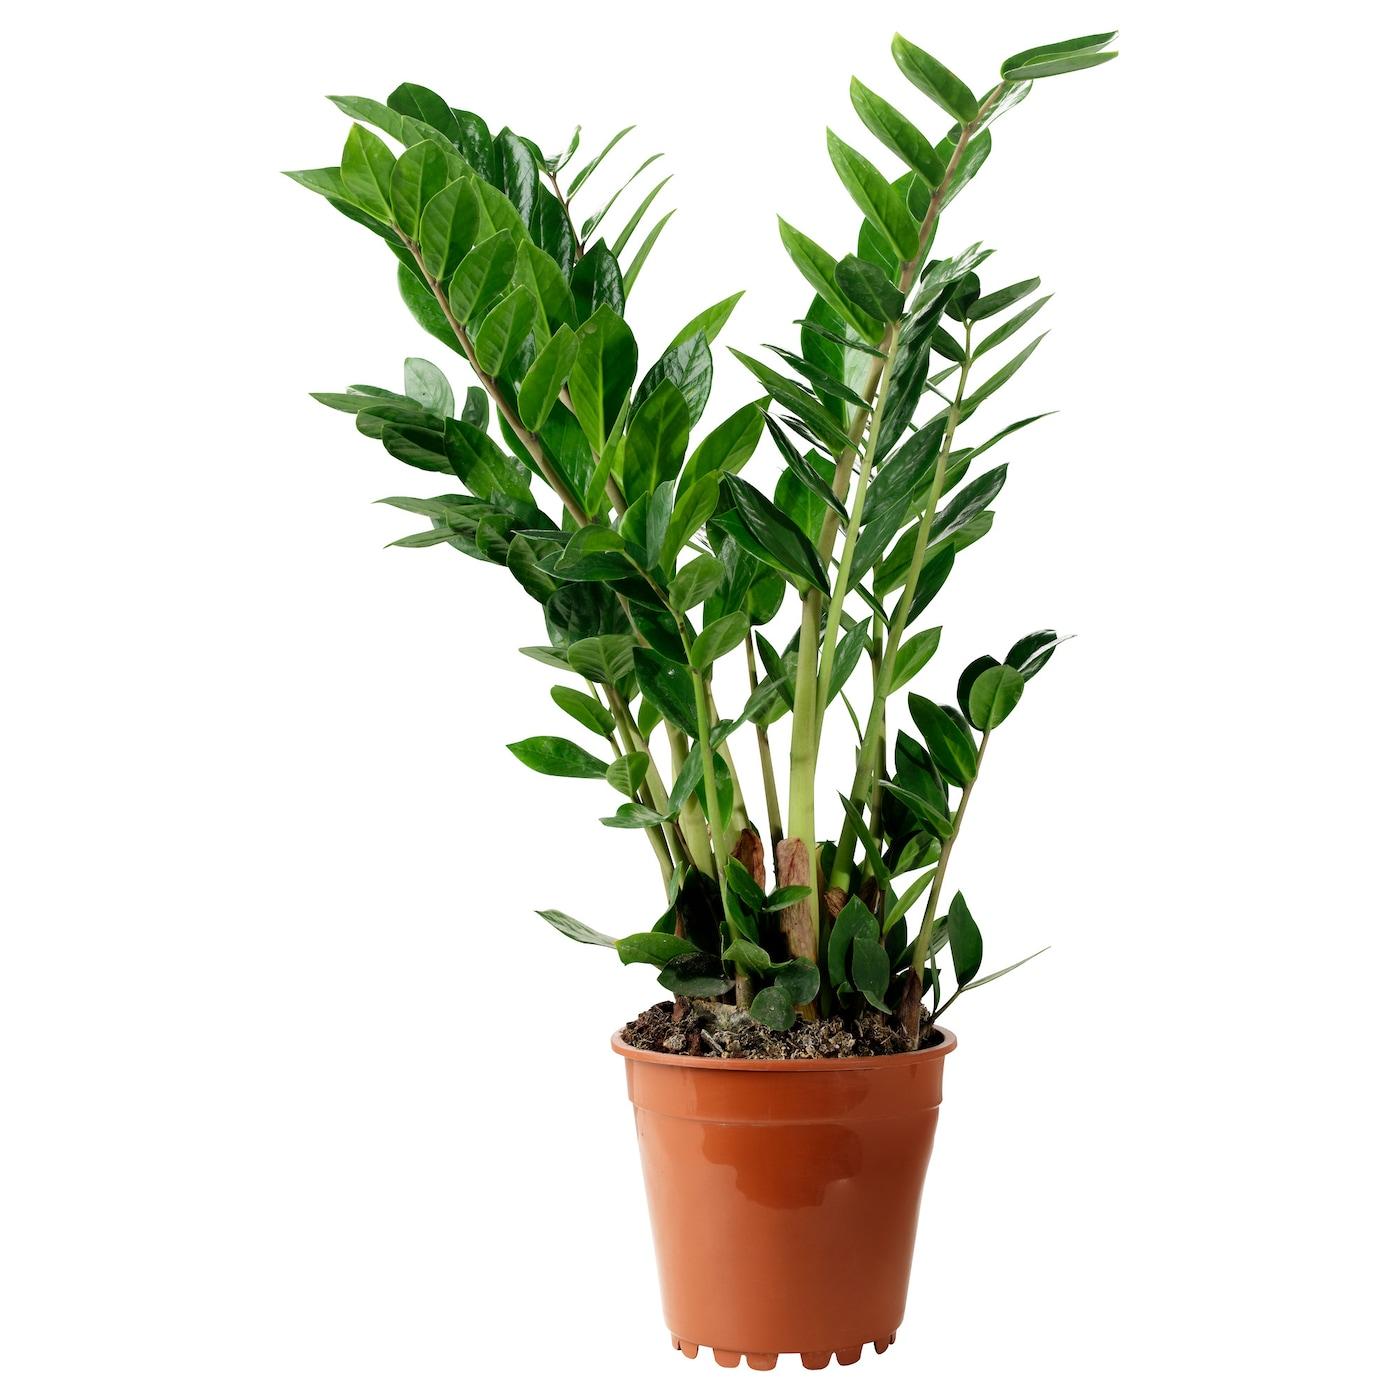 ZAMIOCULCAS Potted plant Aroid palm 17 cm - IKEA